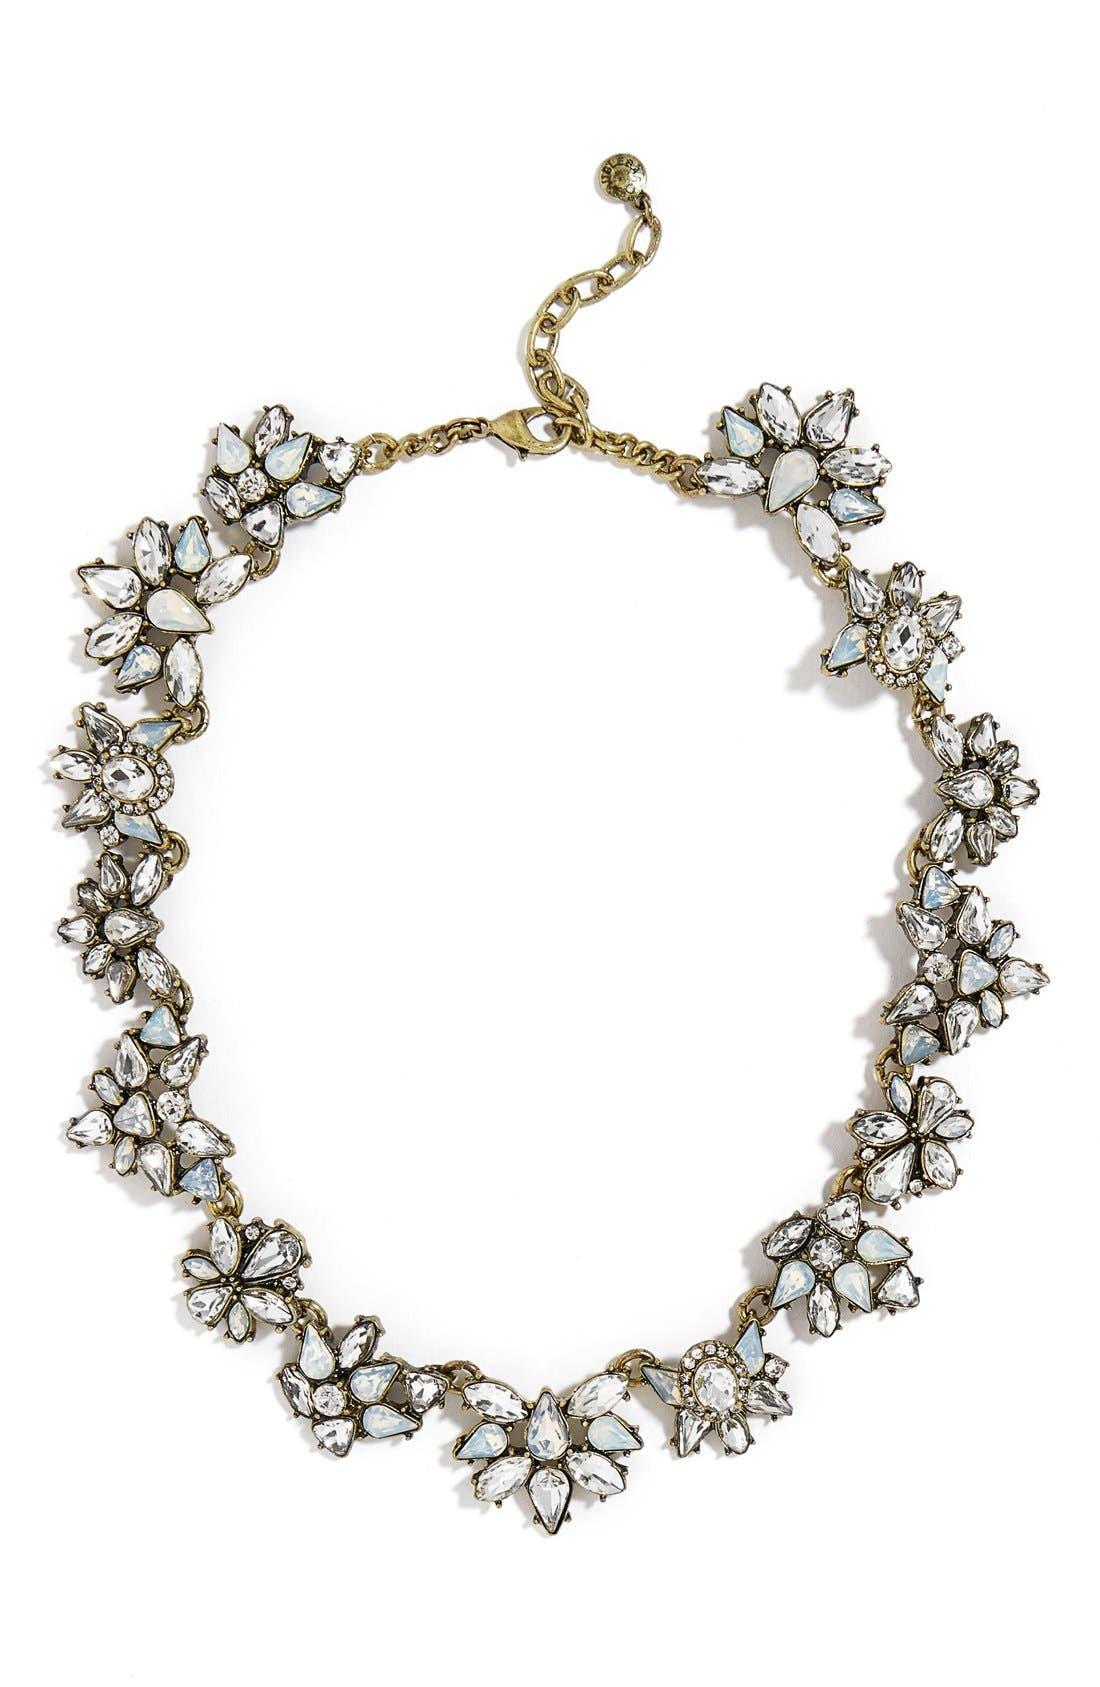 Main Image - BaubleBar Araz Crystal Collar Necklace